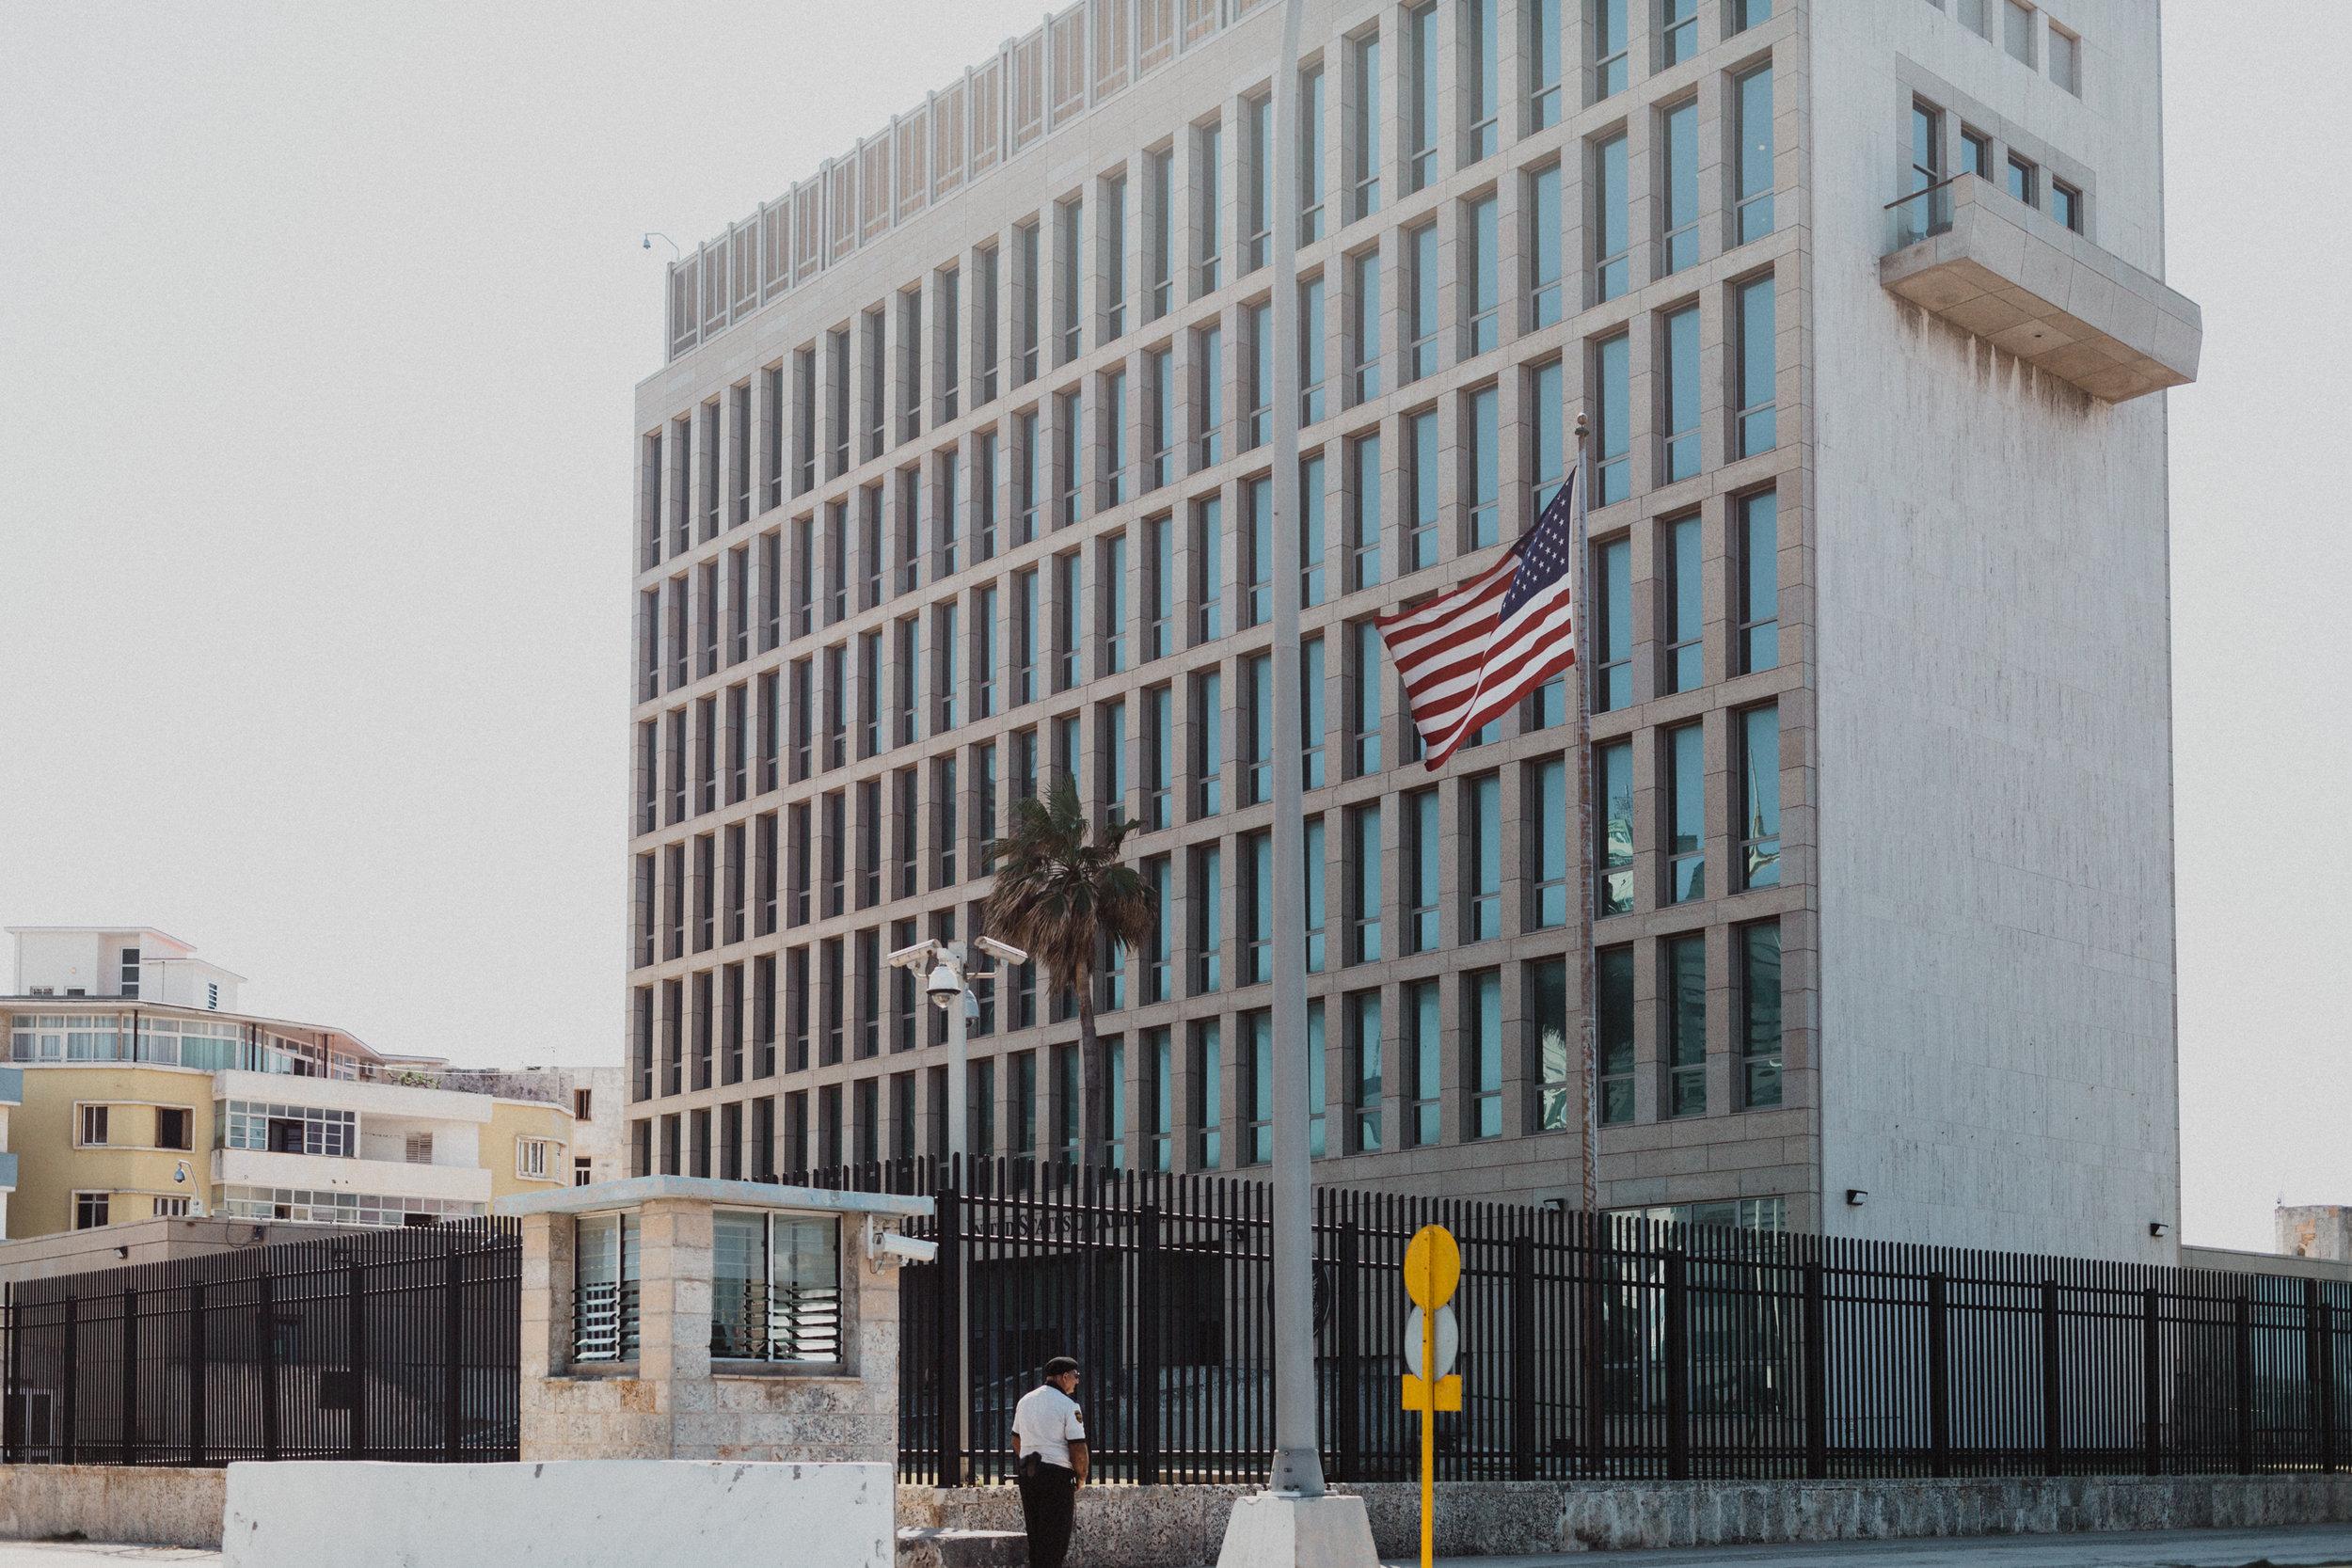 CMR-OO-Cuba-Feb2019-0989.jpg